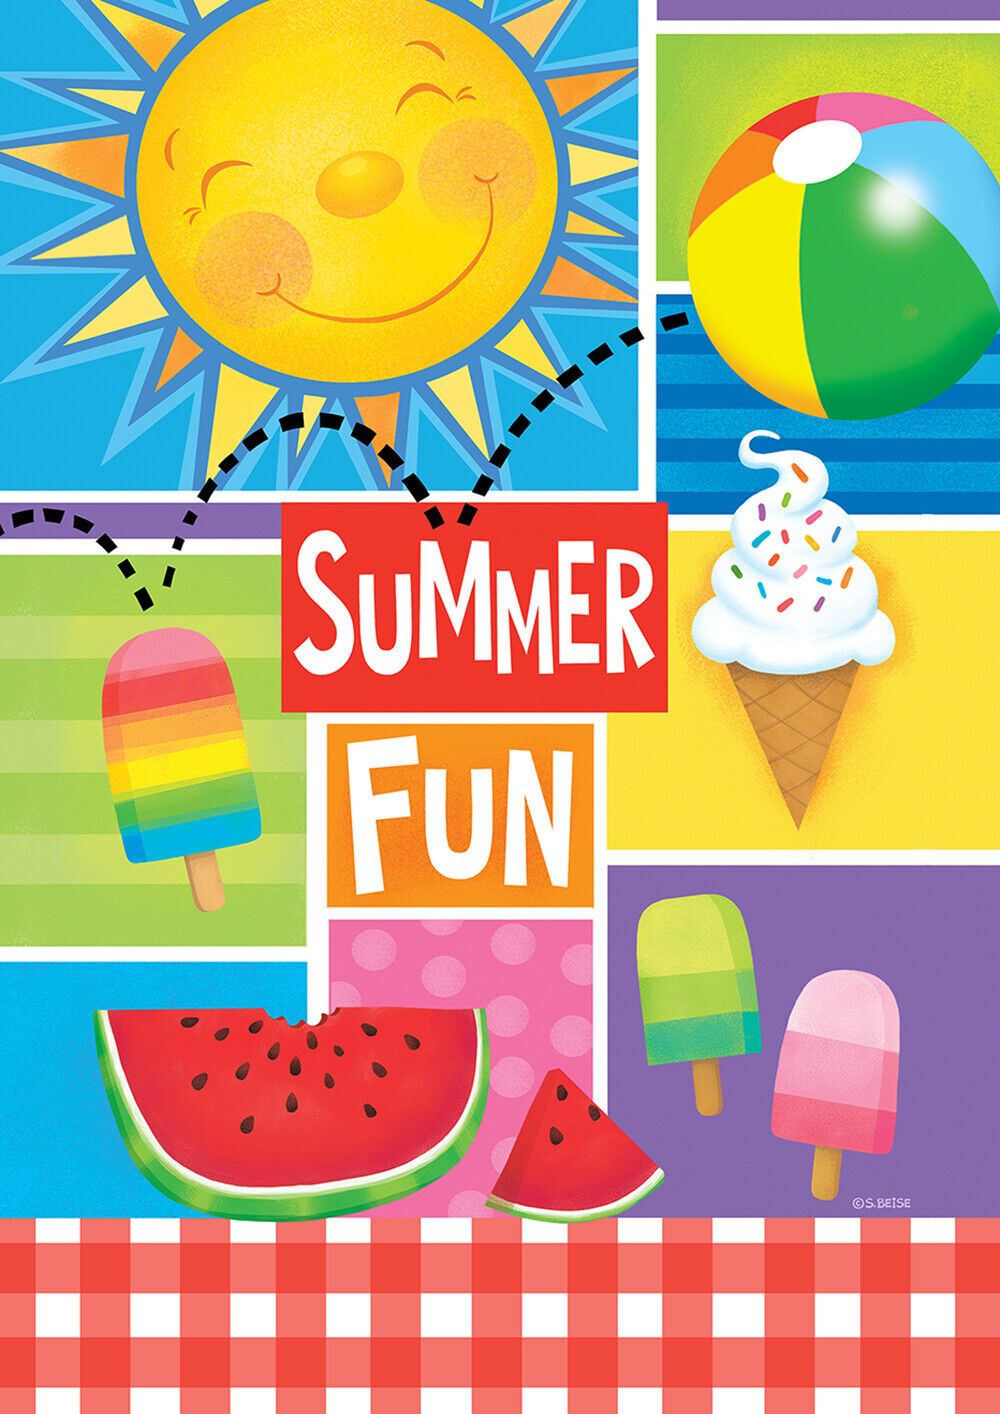 Toland Summer Fun 12.5 x 18 Picnic Sunshine Colorful Garden